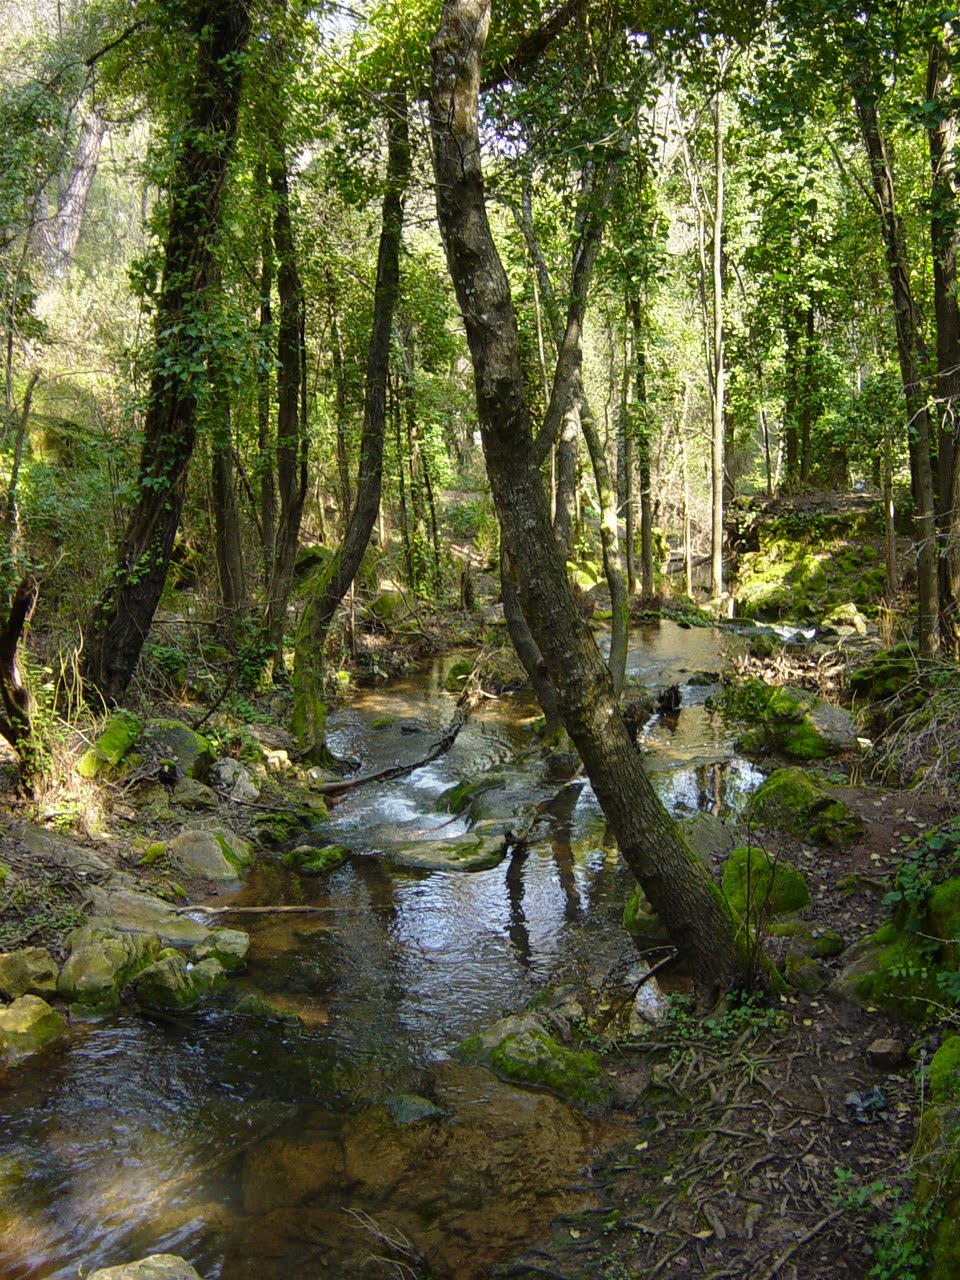 Baño Familiar Publico: Montaña Piedra Luenga: RUTA FAMILIAR ARROYO BEJARANO- BAÑOS DE POPEA